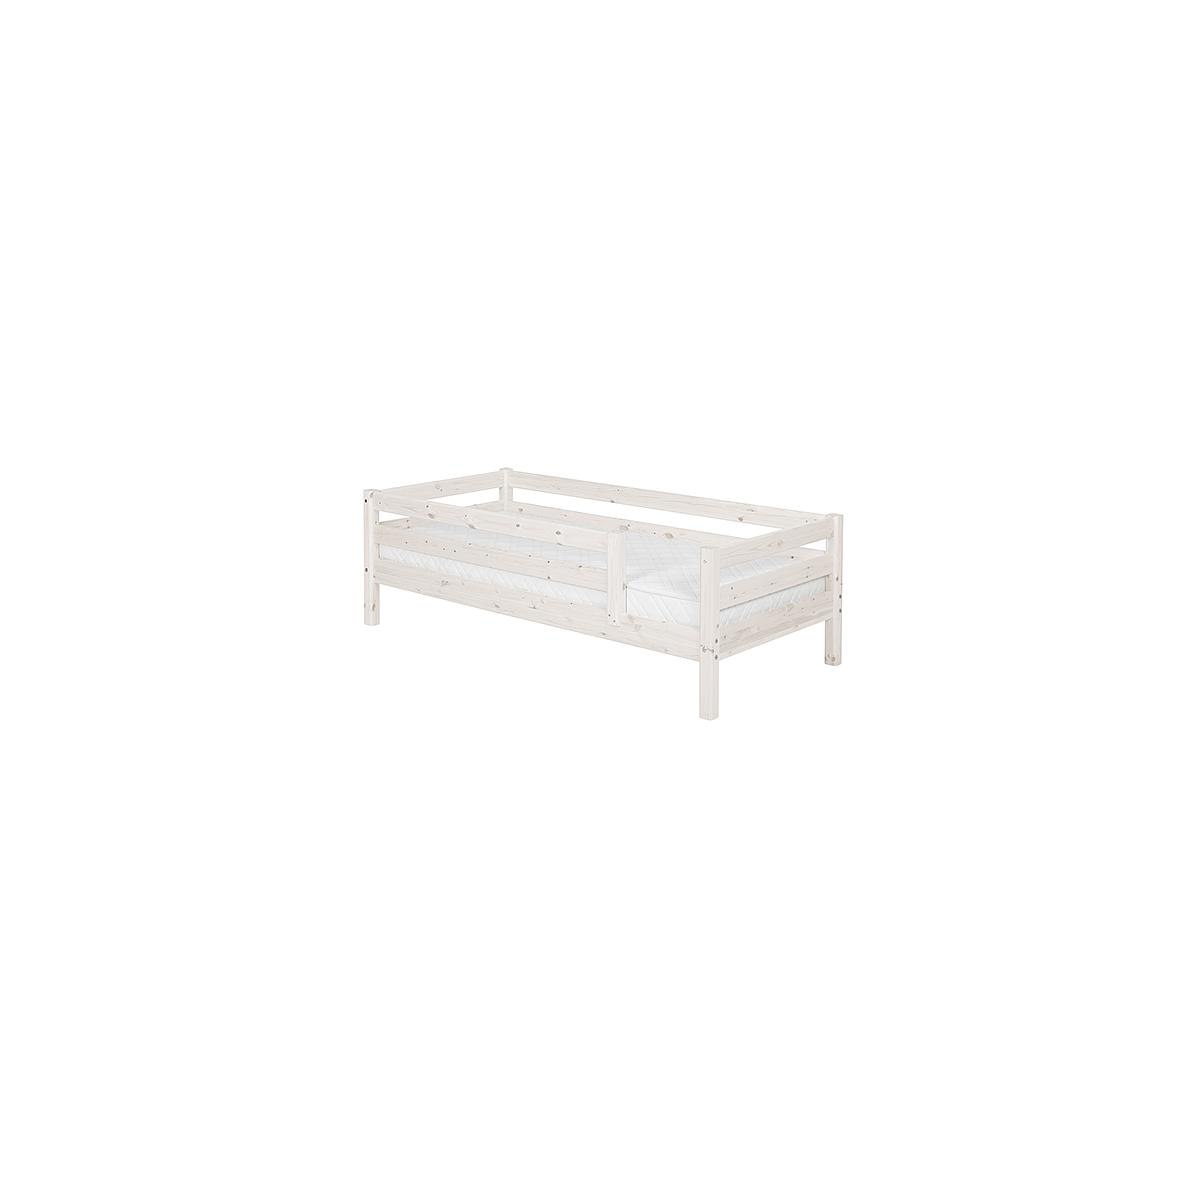 Cama individual barrera 3/4 90x190 CLASSIC Flexa blanco cal